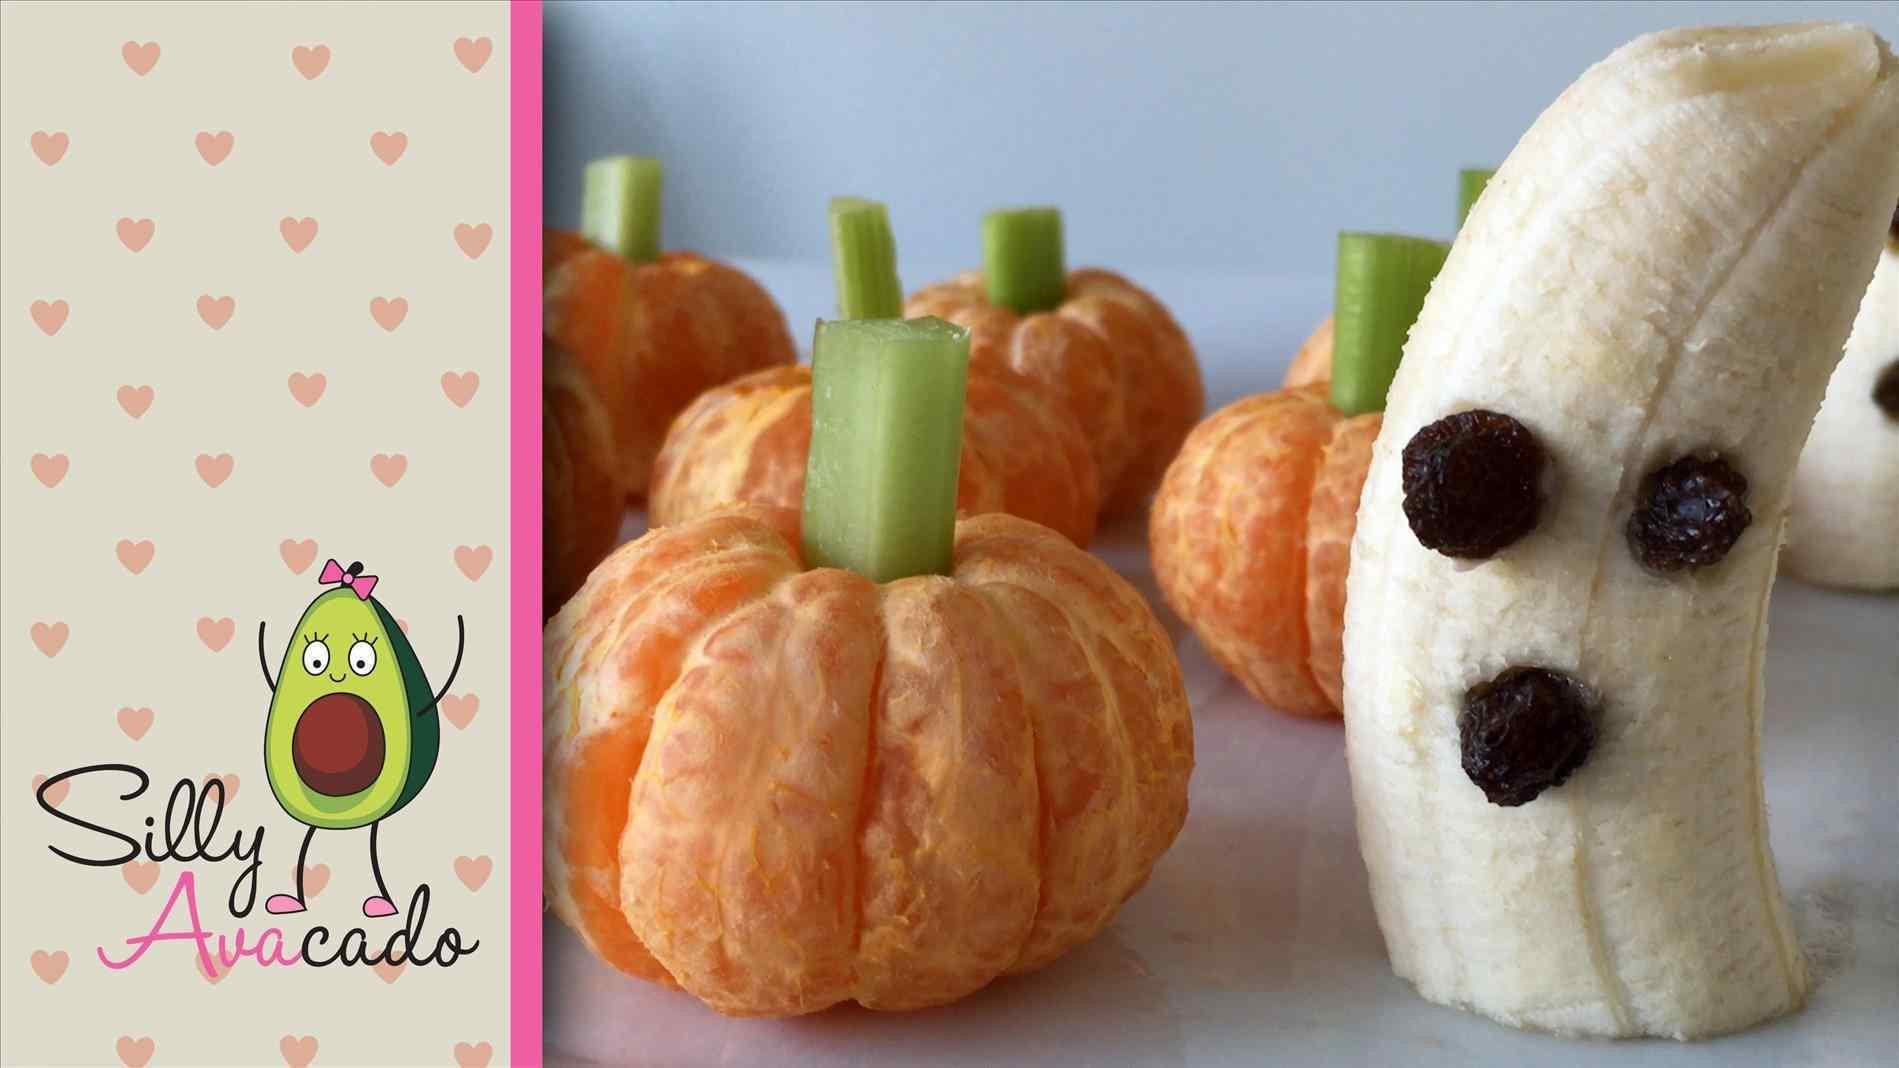 Healthy Halloween Snacks For School  Healthy Halloween Snacks For Kids 2018 OgaHealth